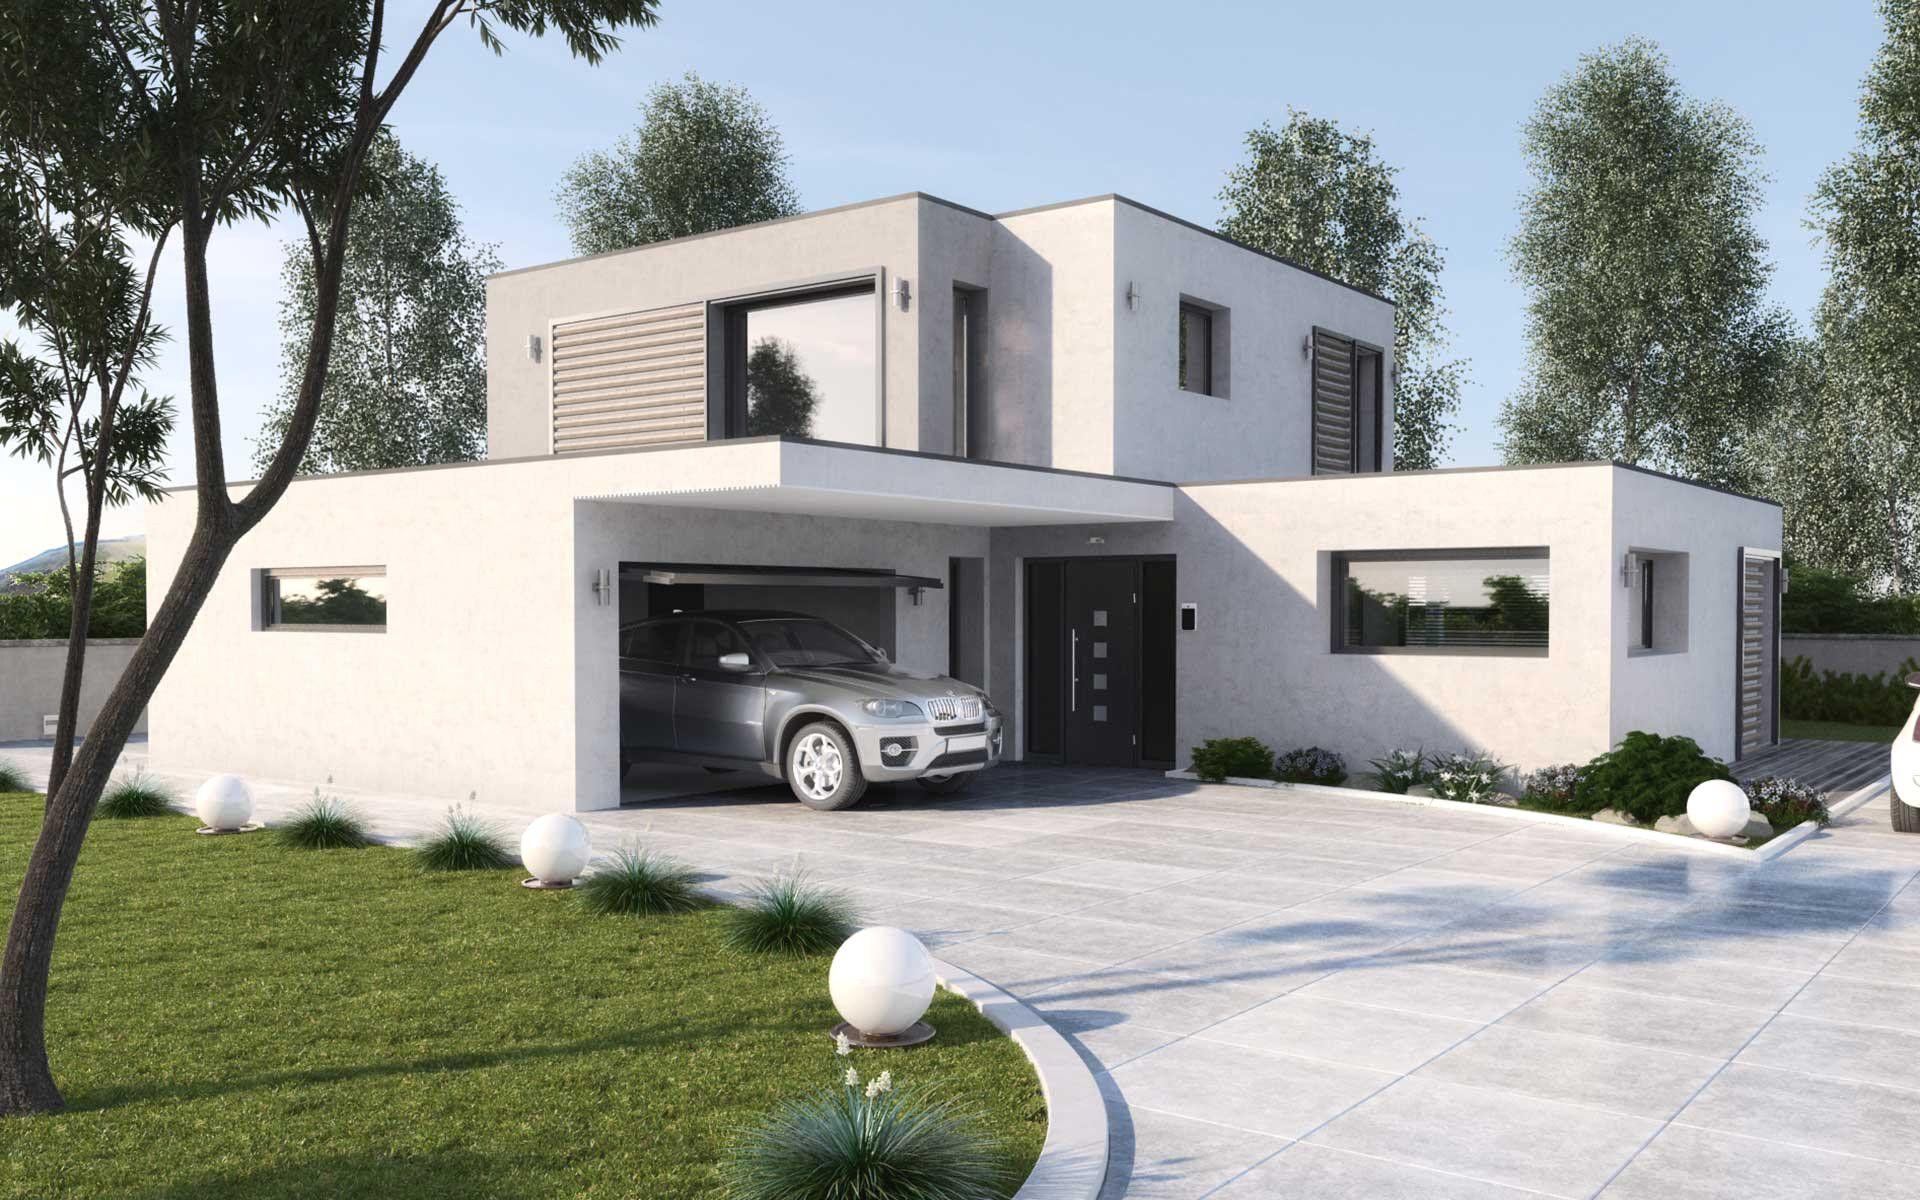 Idee Maison Sims 4 Avec Idee Construction Maison Sims 4 Avec Sims 3 Modern Moderne House Idees Et Idee Construction Haus Architektur Haus Design Fassade Haus